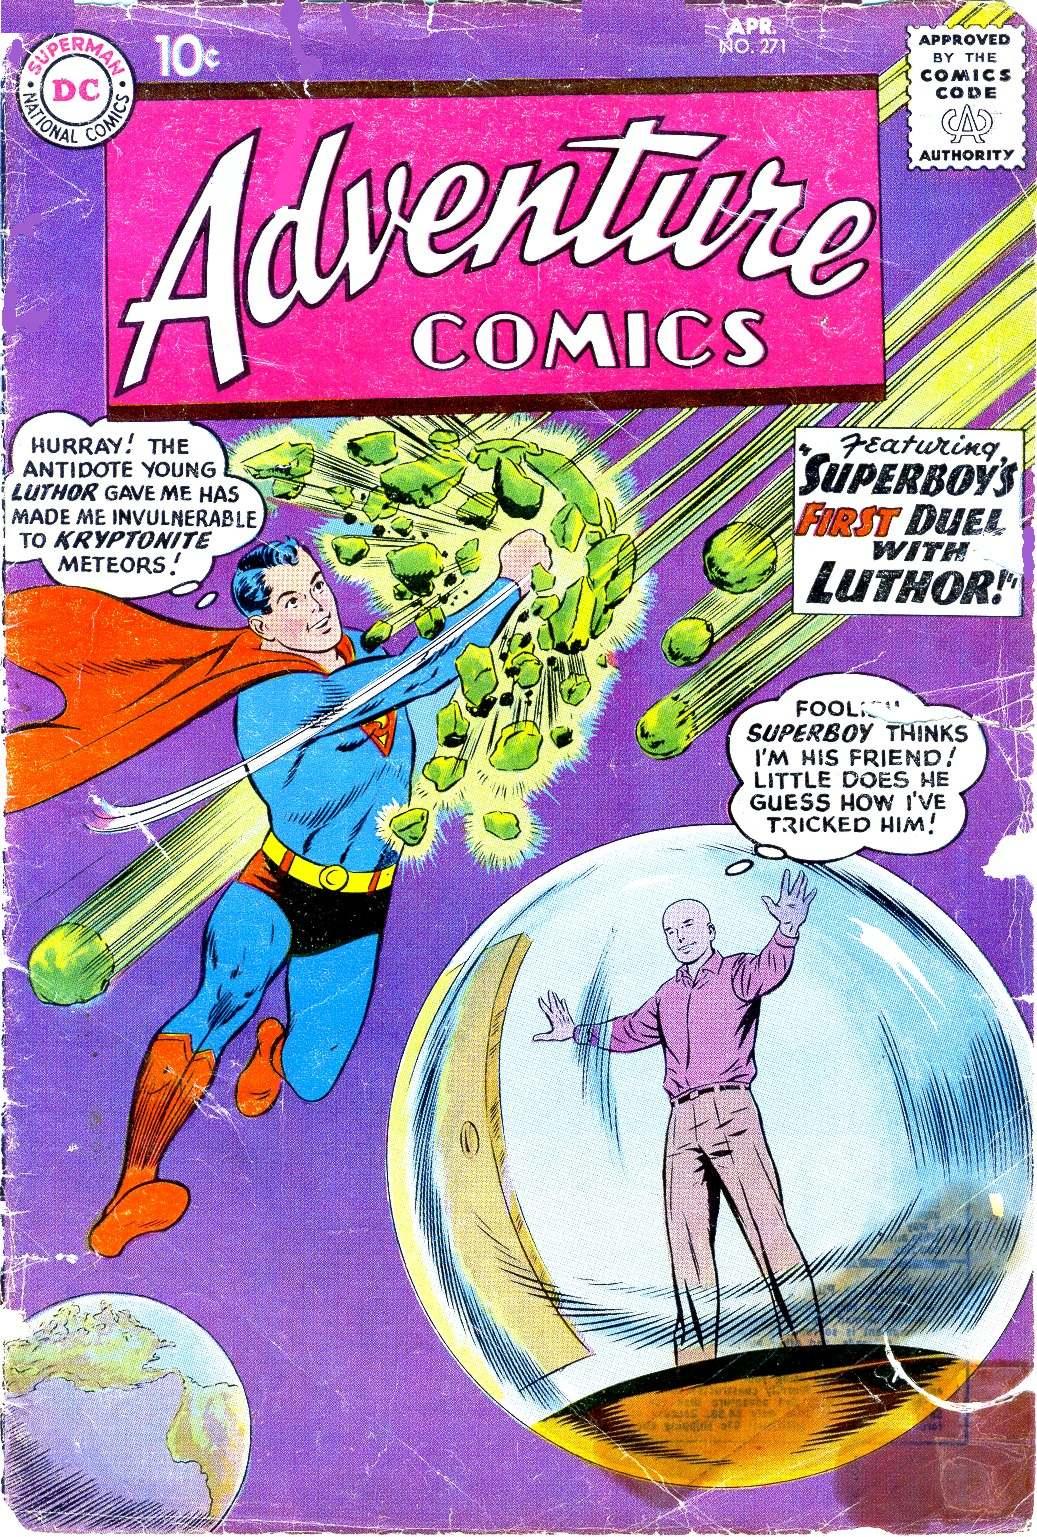 Read online Adventure Comics (1938) comic -  Issue #271 - 1